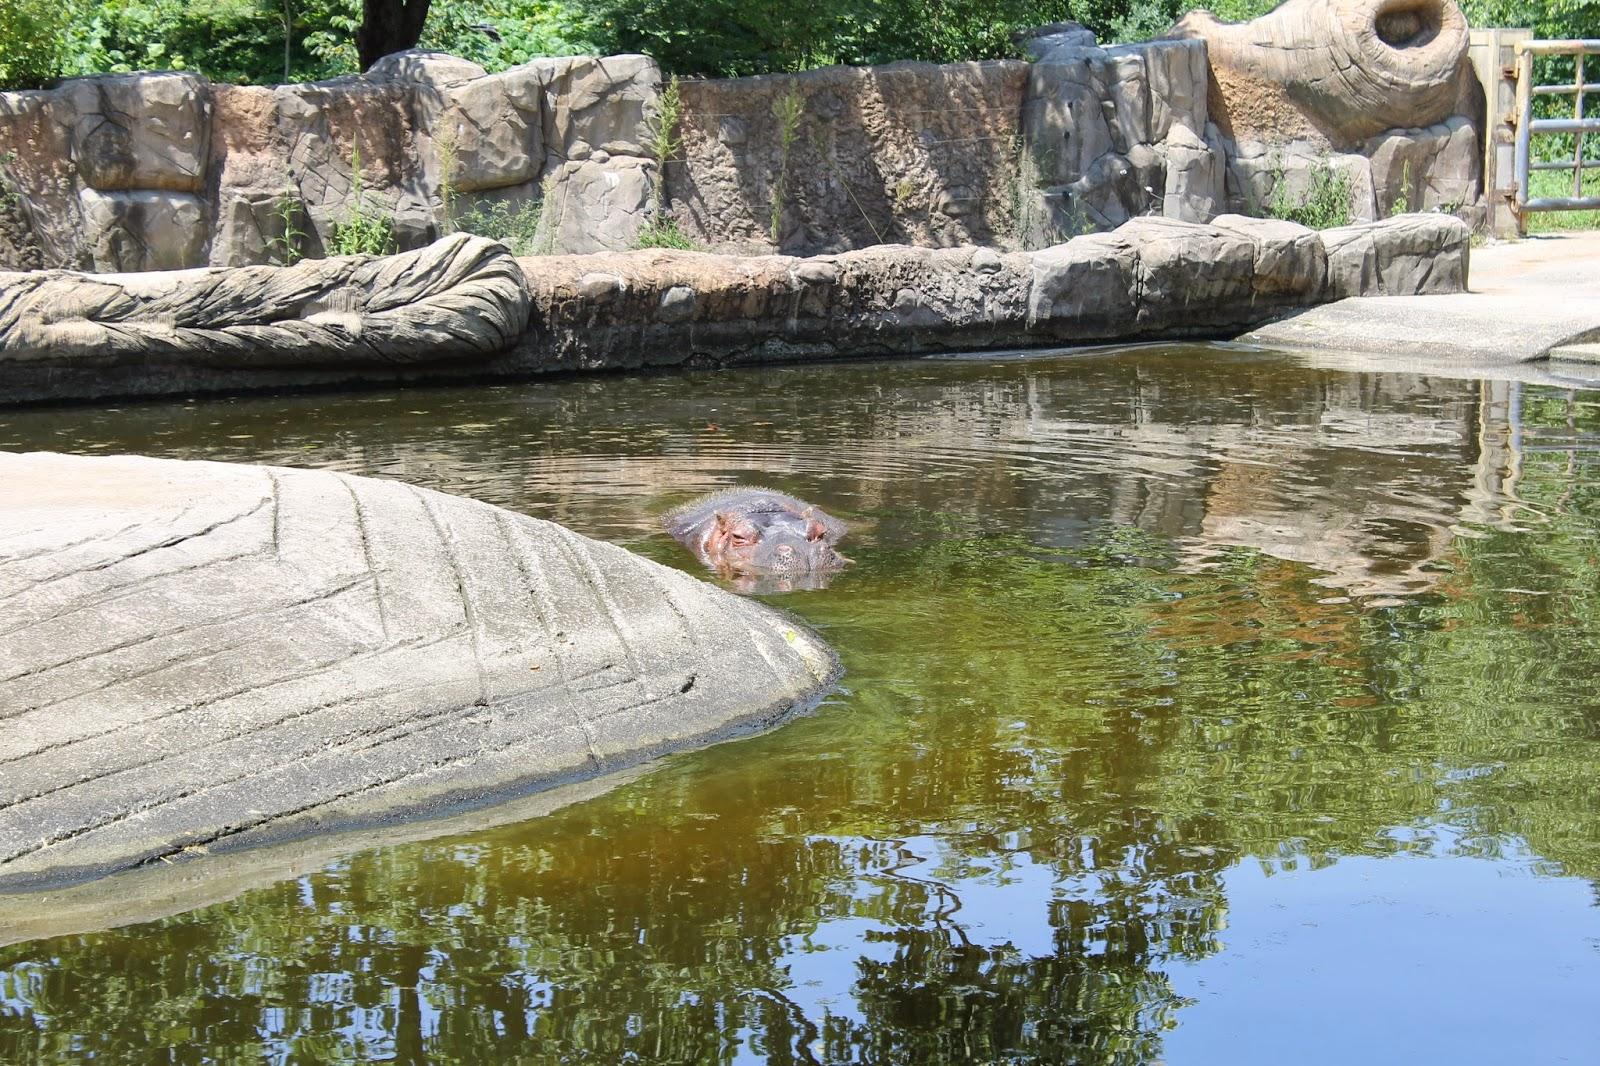 Seoul Zoo, Seoul, зоопарк в сеуле, сеул, корея, зоопарк, бегемот